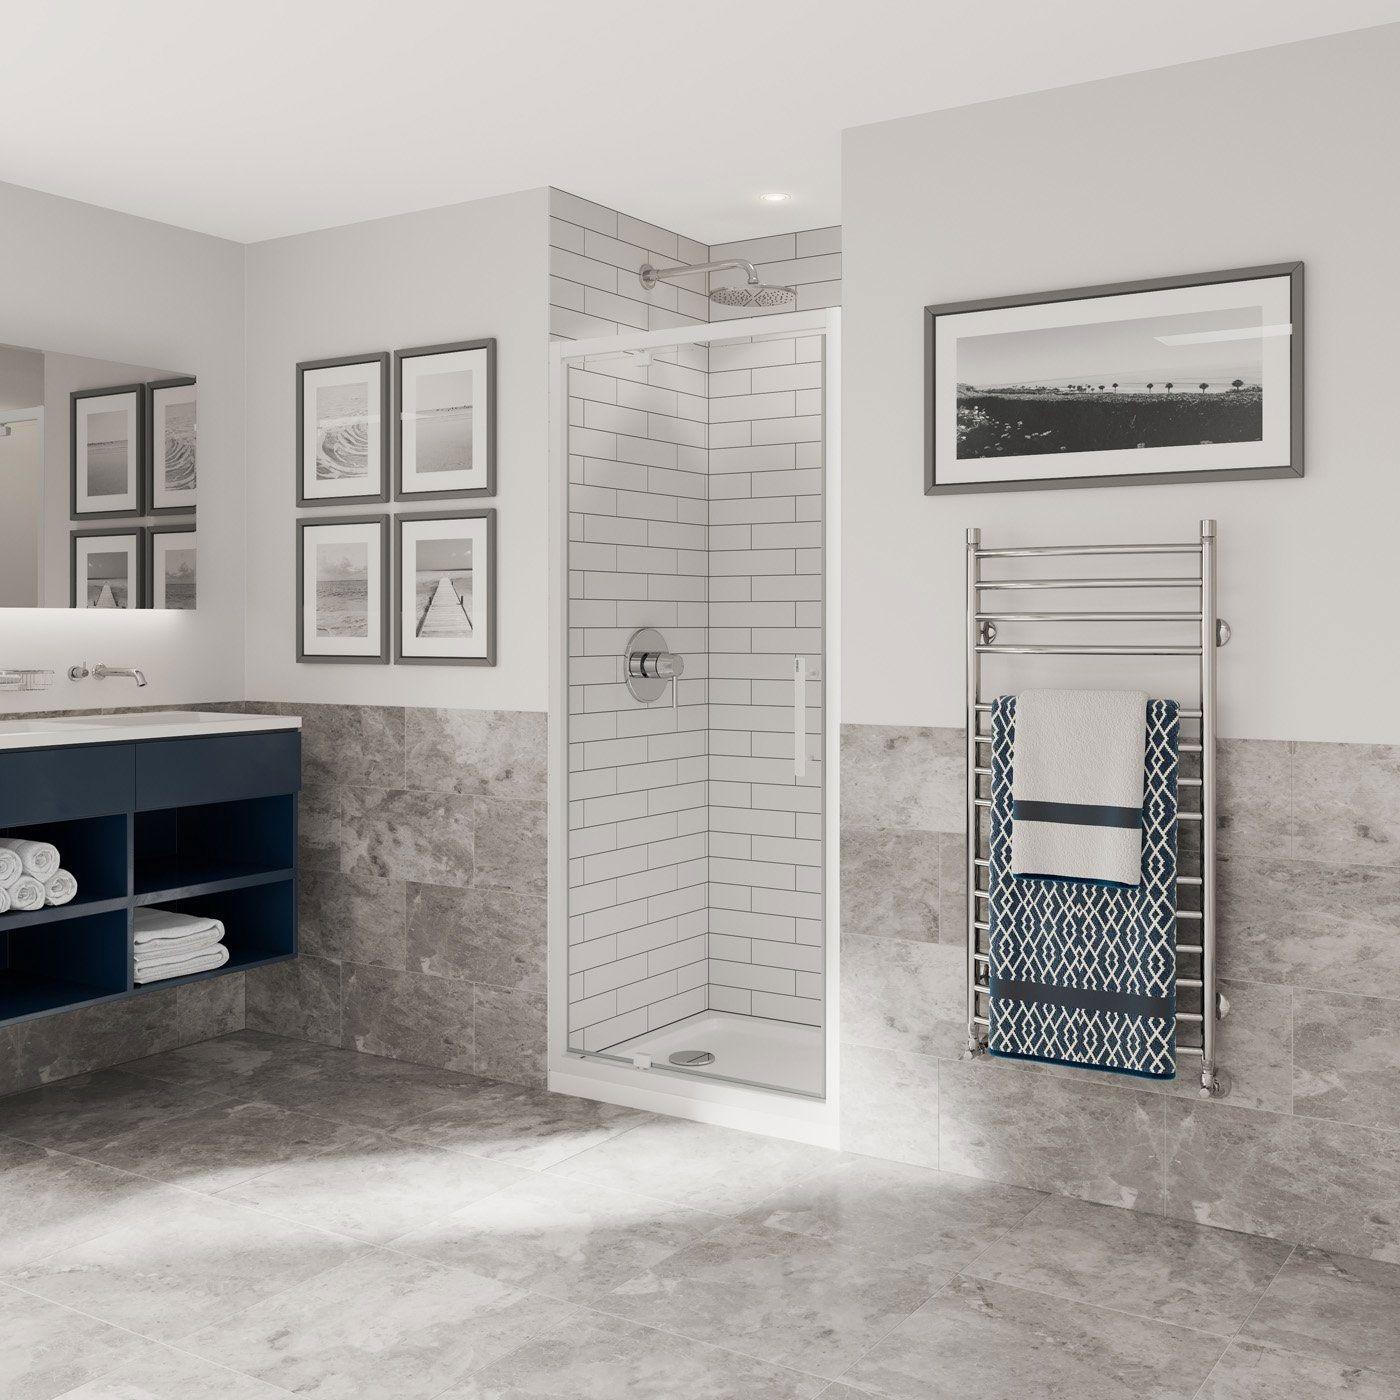 Coram Optima 6 Pivot Shower Door O6pi76cuw 760mm White Clear Shower Doors Shower Enclosure Pivot Doors